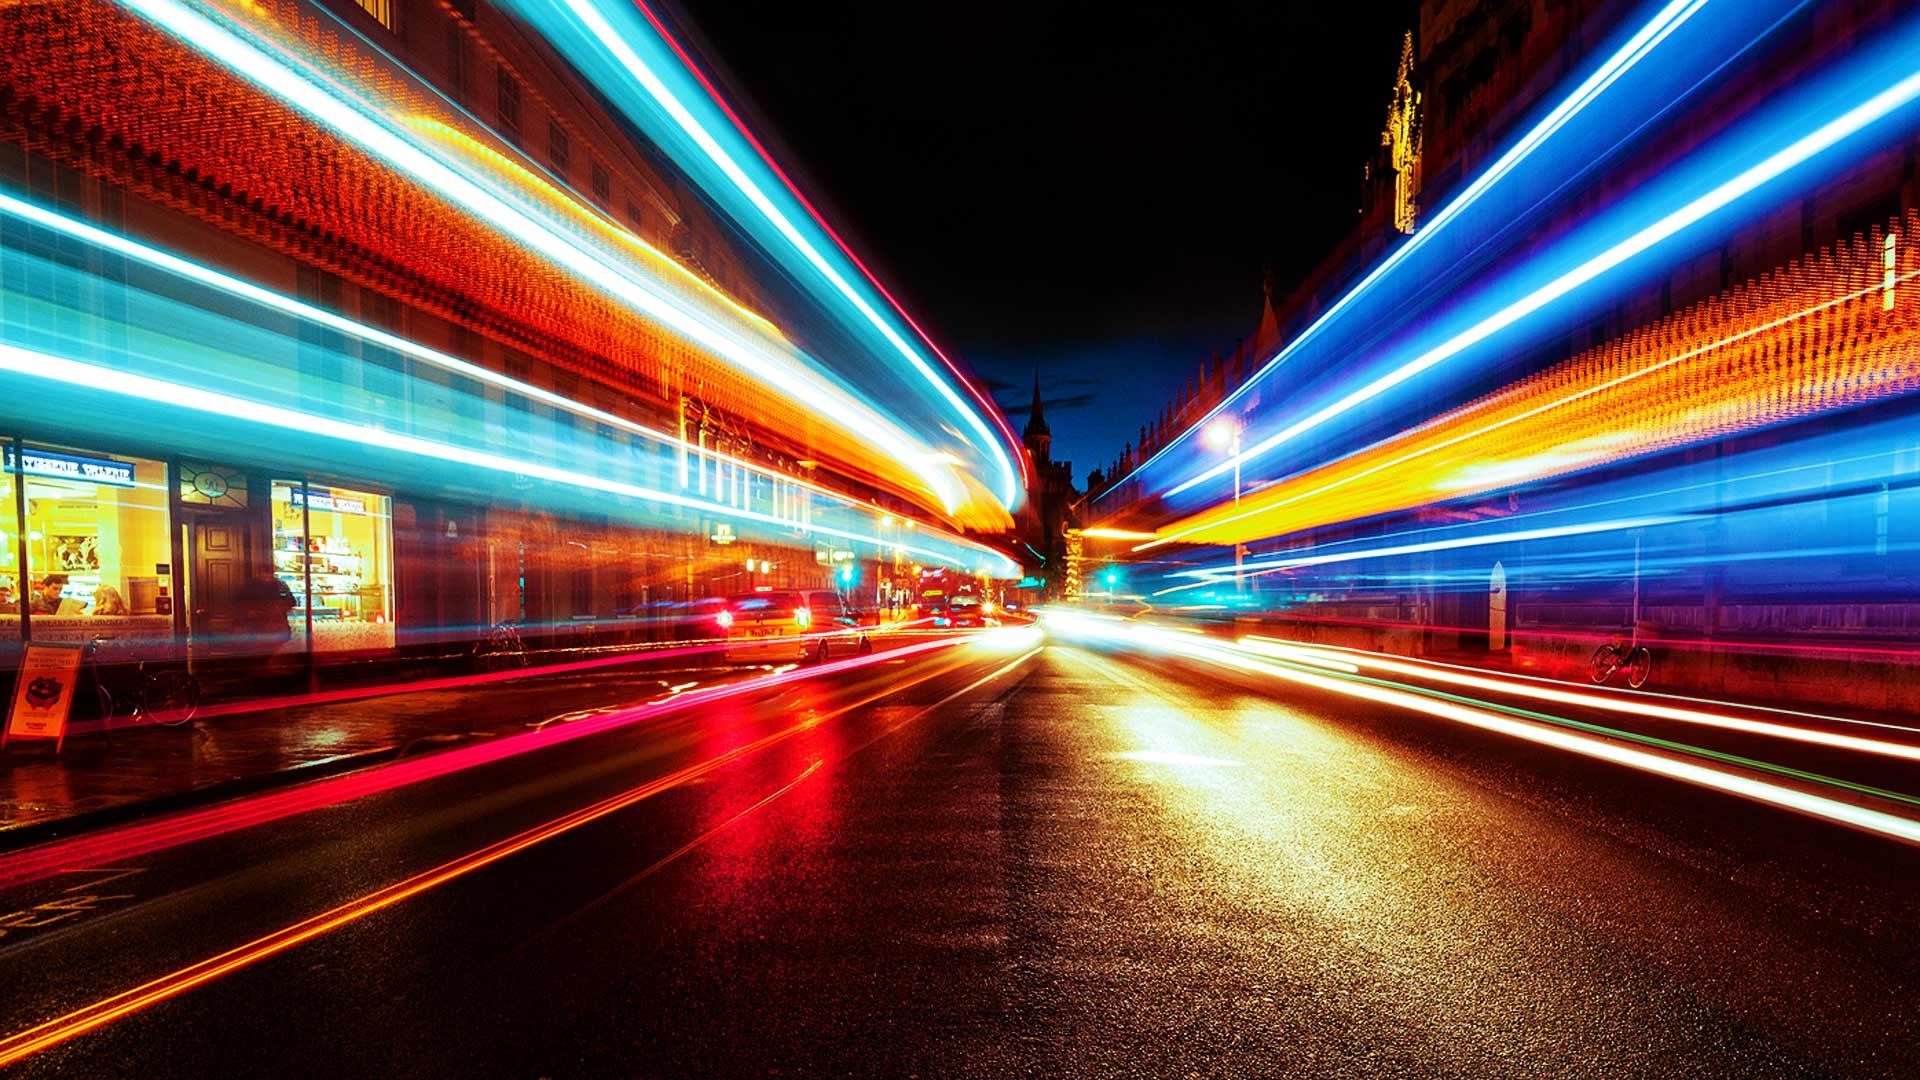 Long exposure city road at night